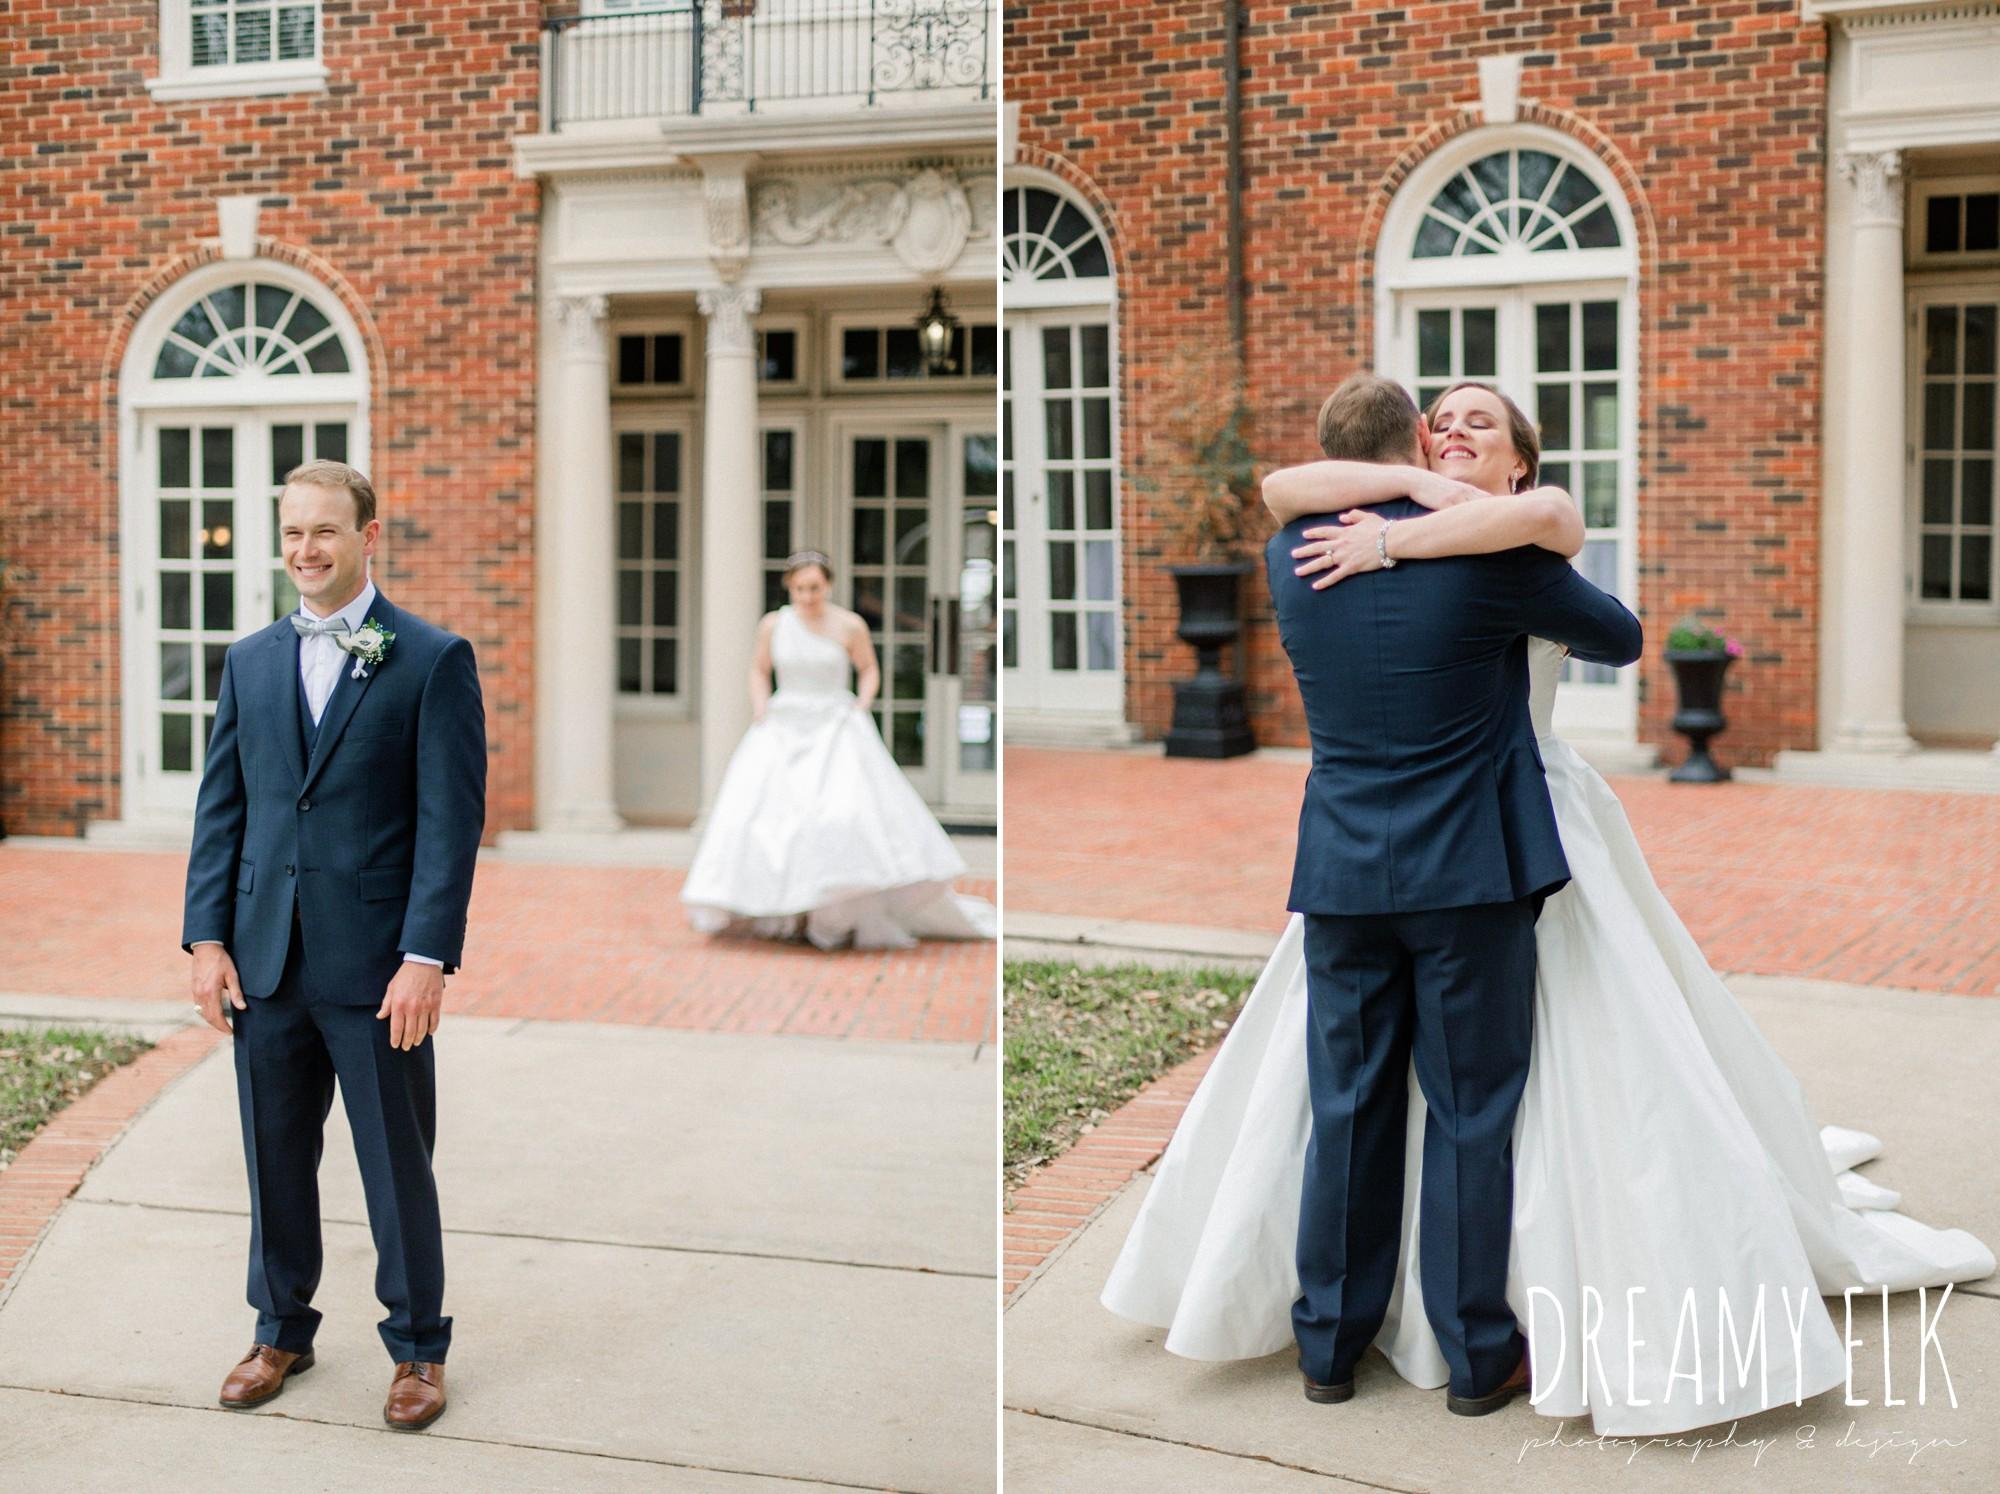 first look, modern wedding dress ballgown, spring wedding, the astin mansion, bryan, texas, spring wedding, dreamy elk photography and design